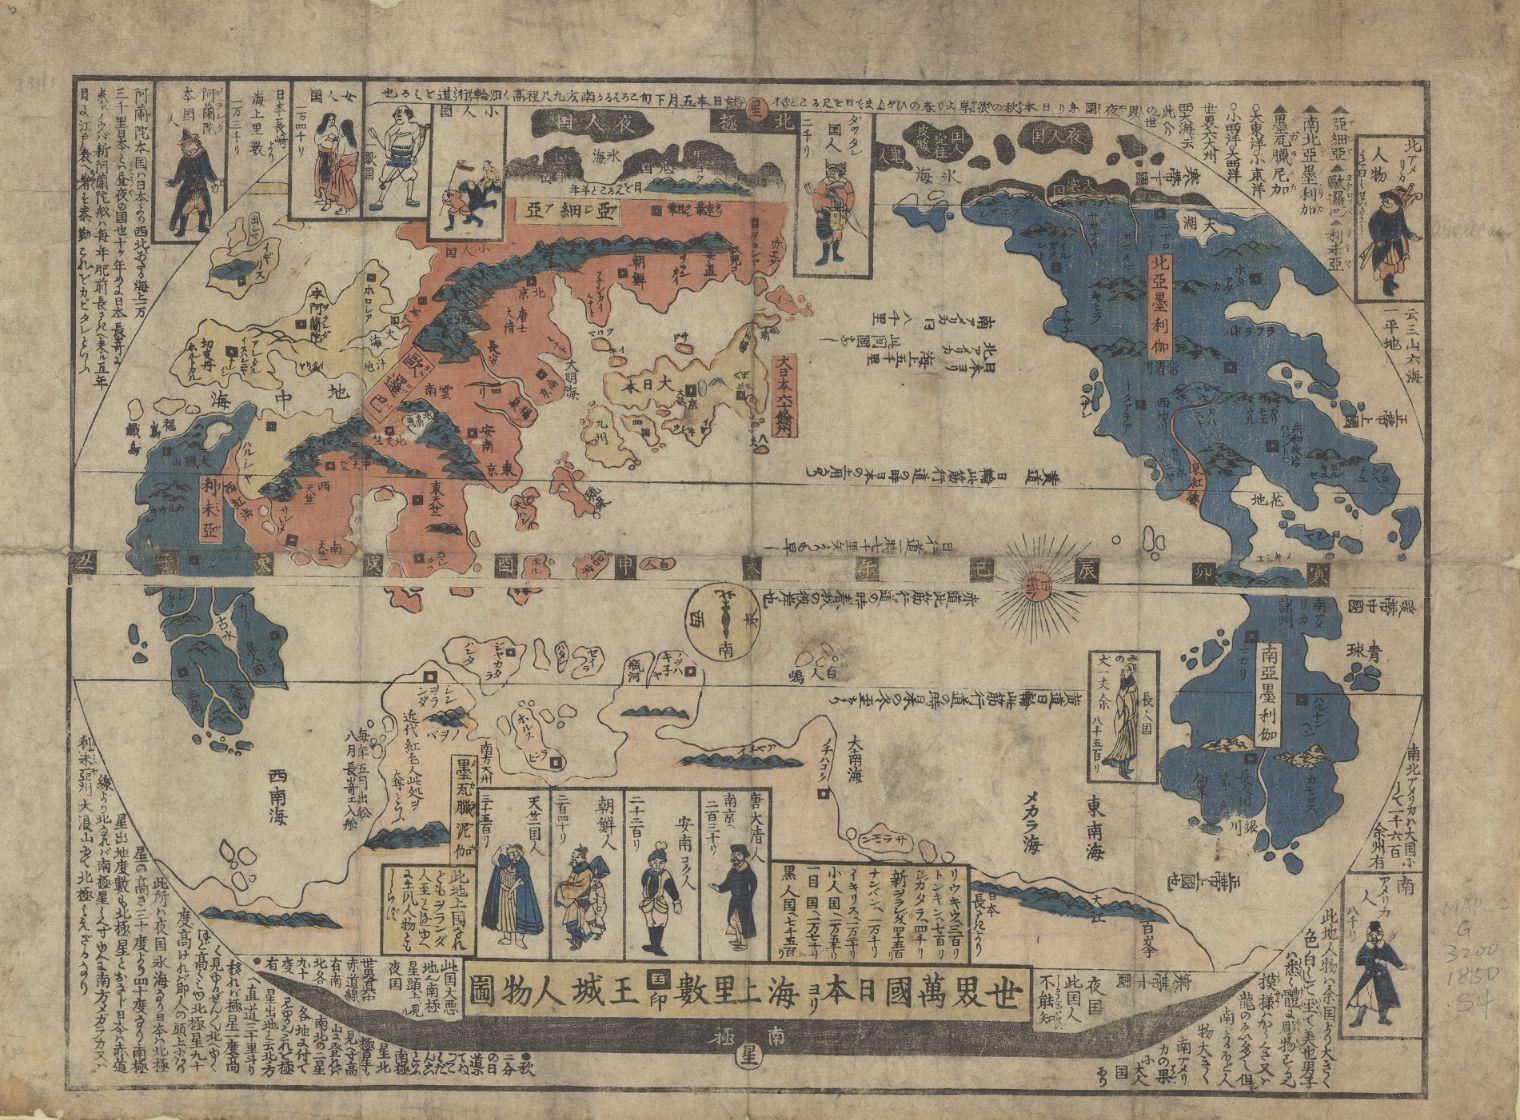 World map centered on japan in yellow tokugawa era c 1850 world map centered on japan in yellow tokugawa era c 1850 publicscrutiny Choice Image